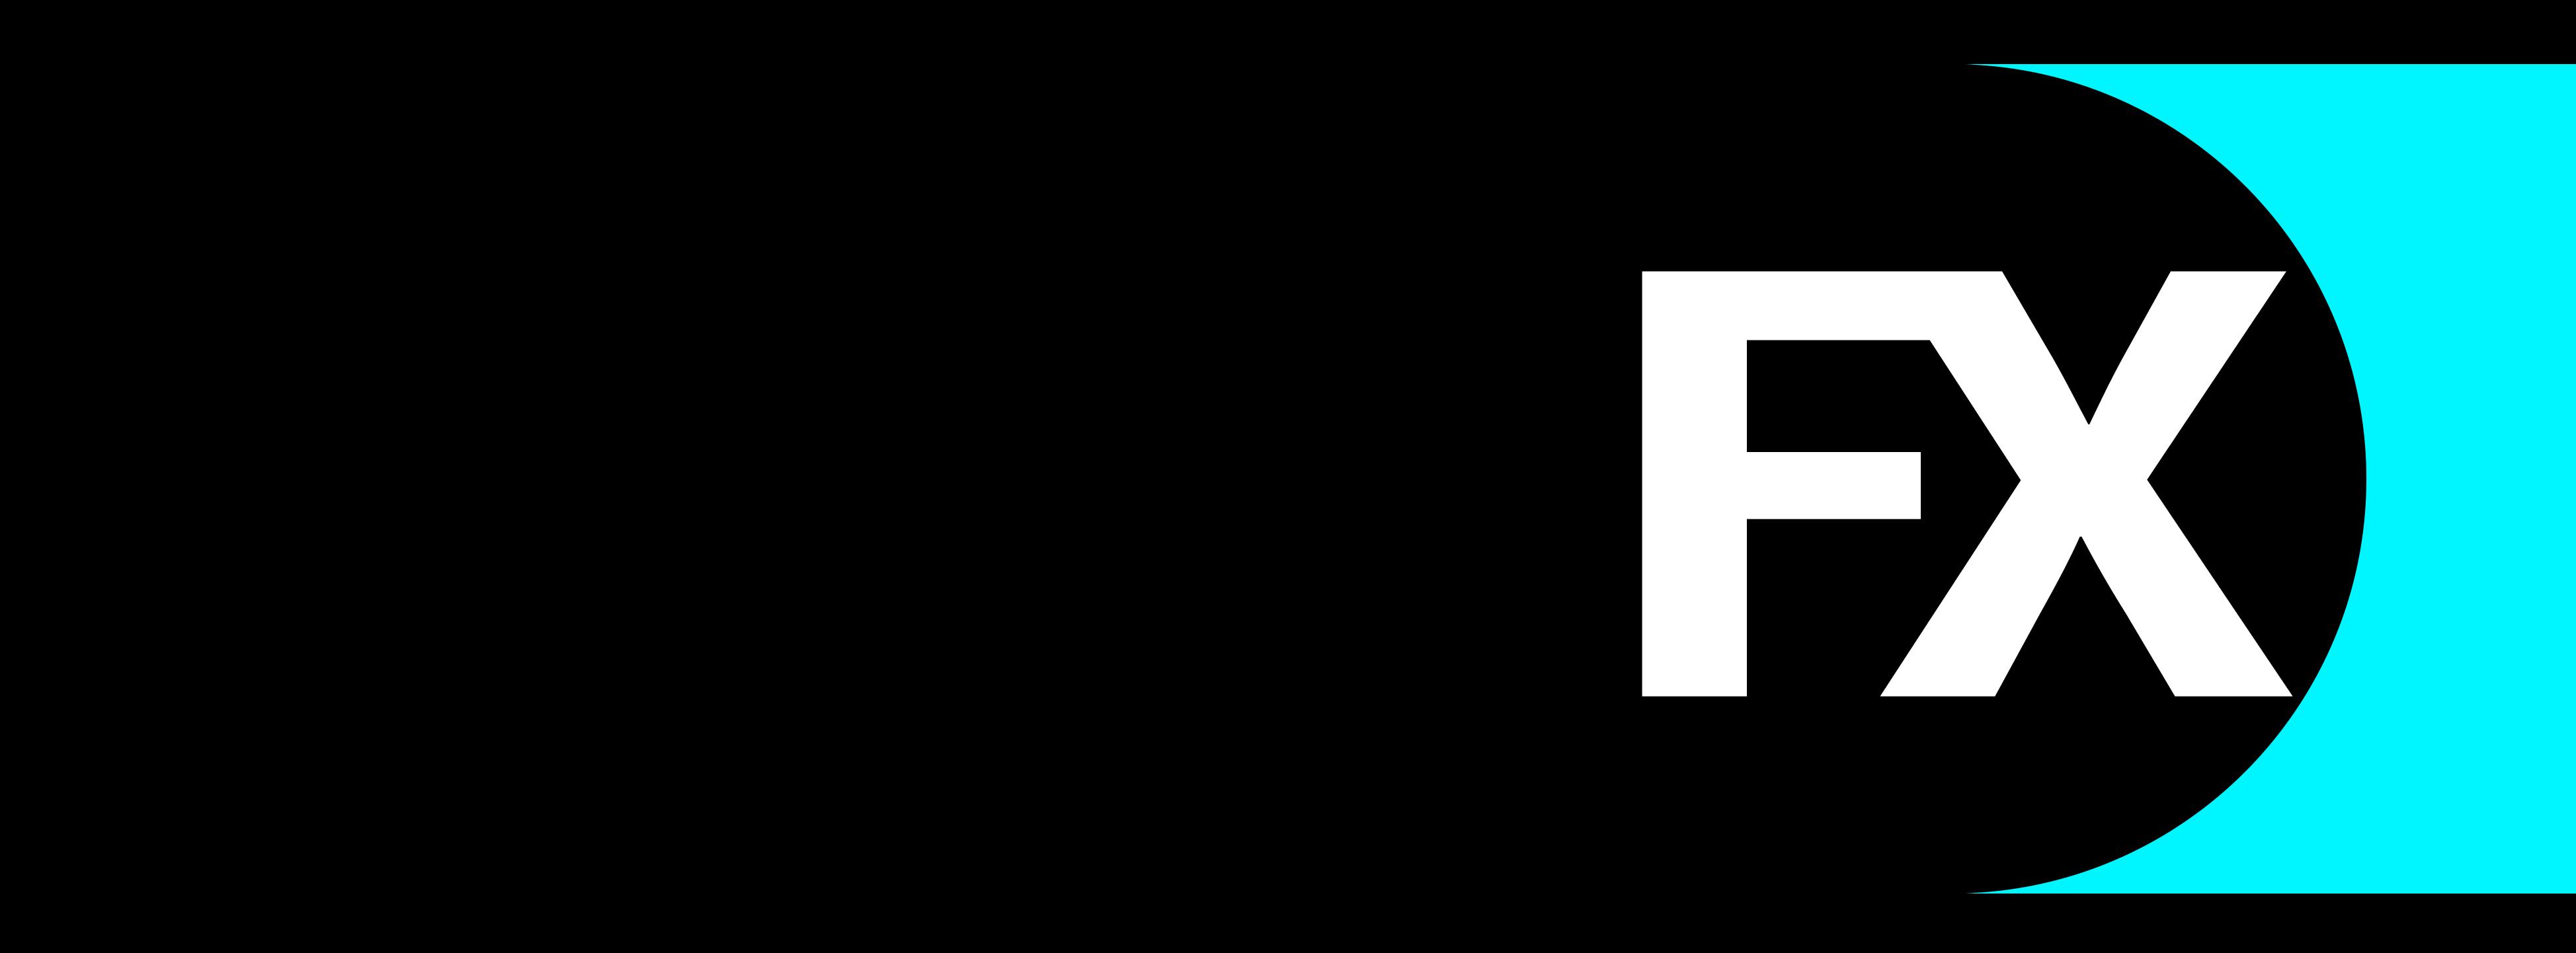 BlendFX Logo